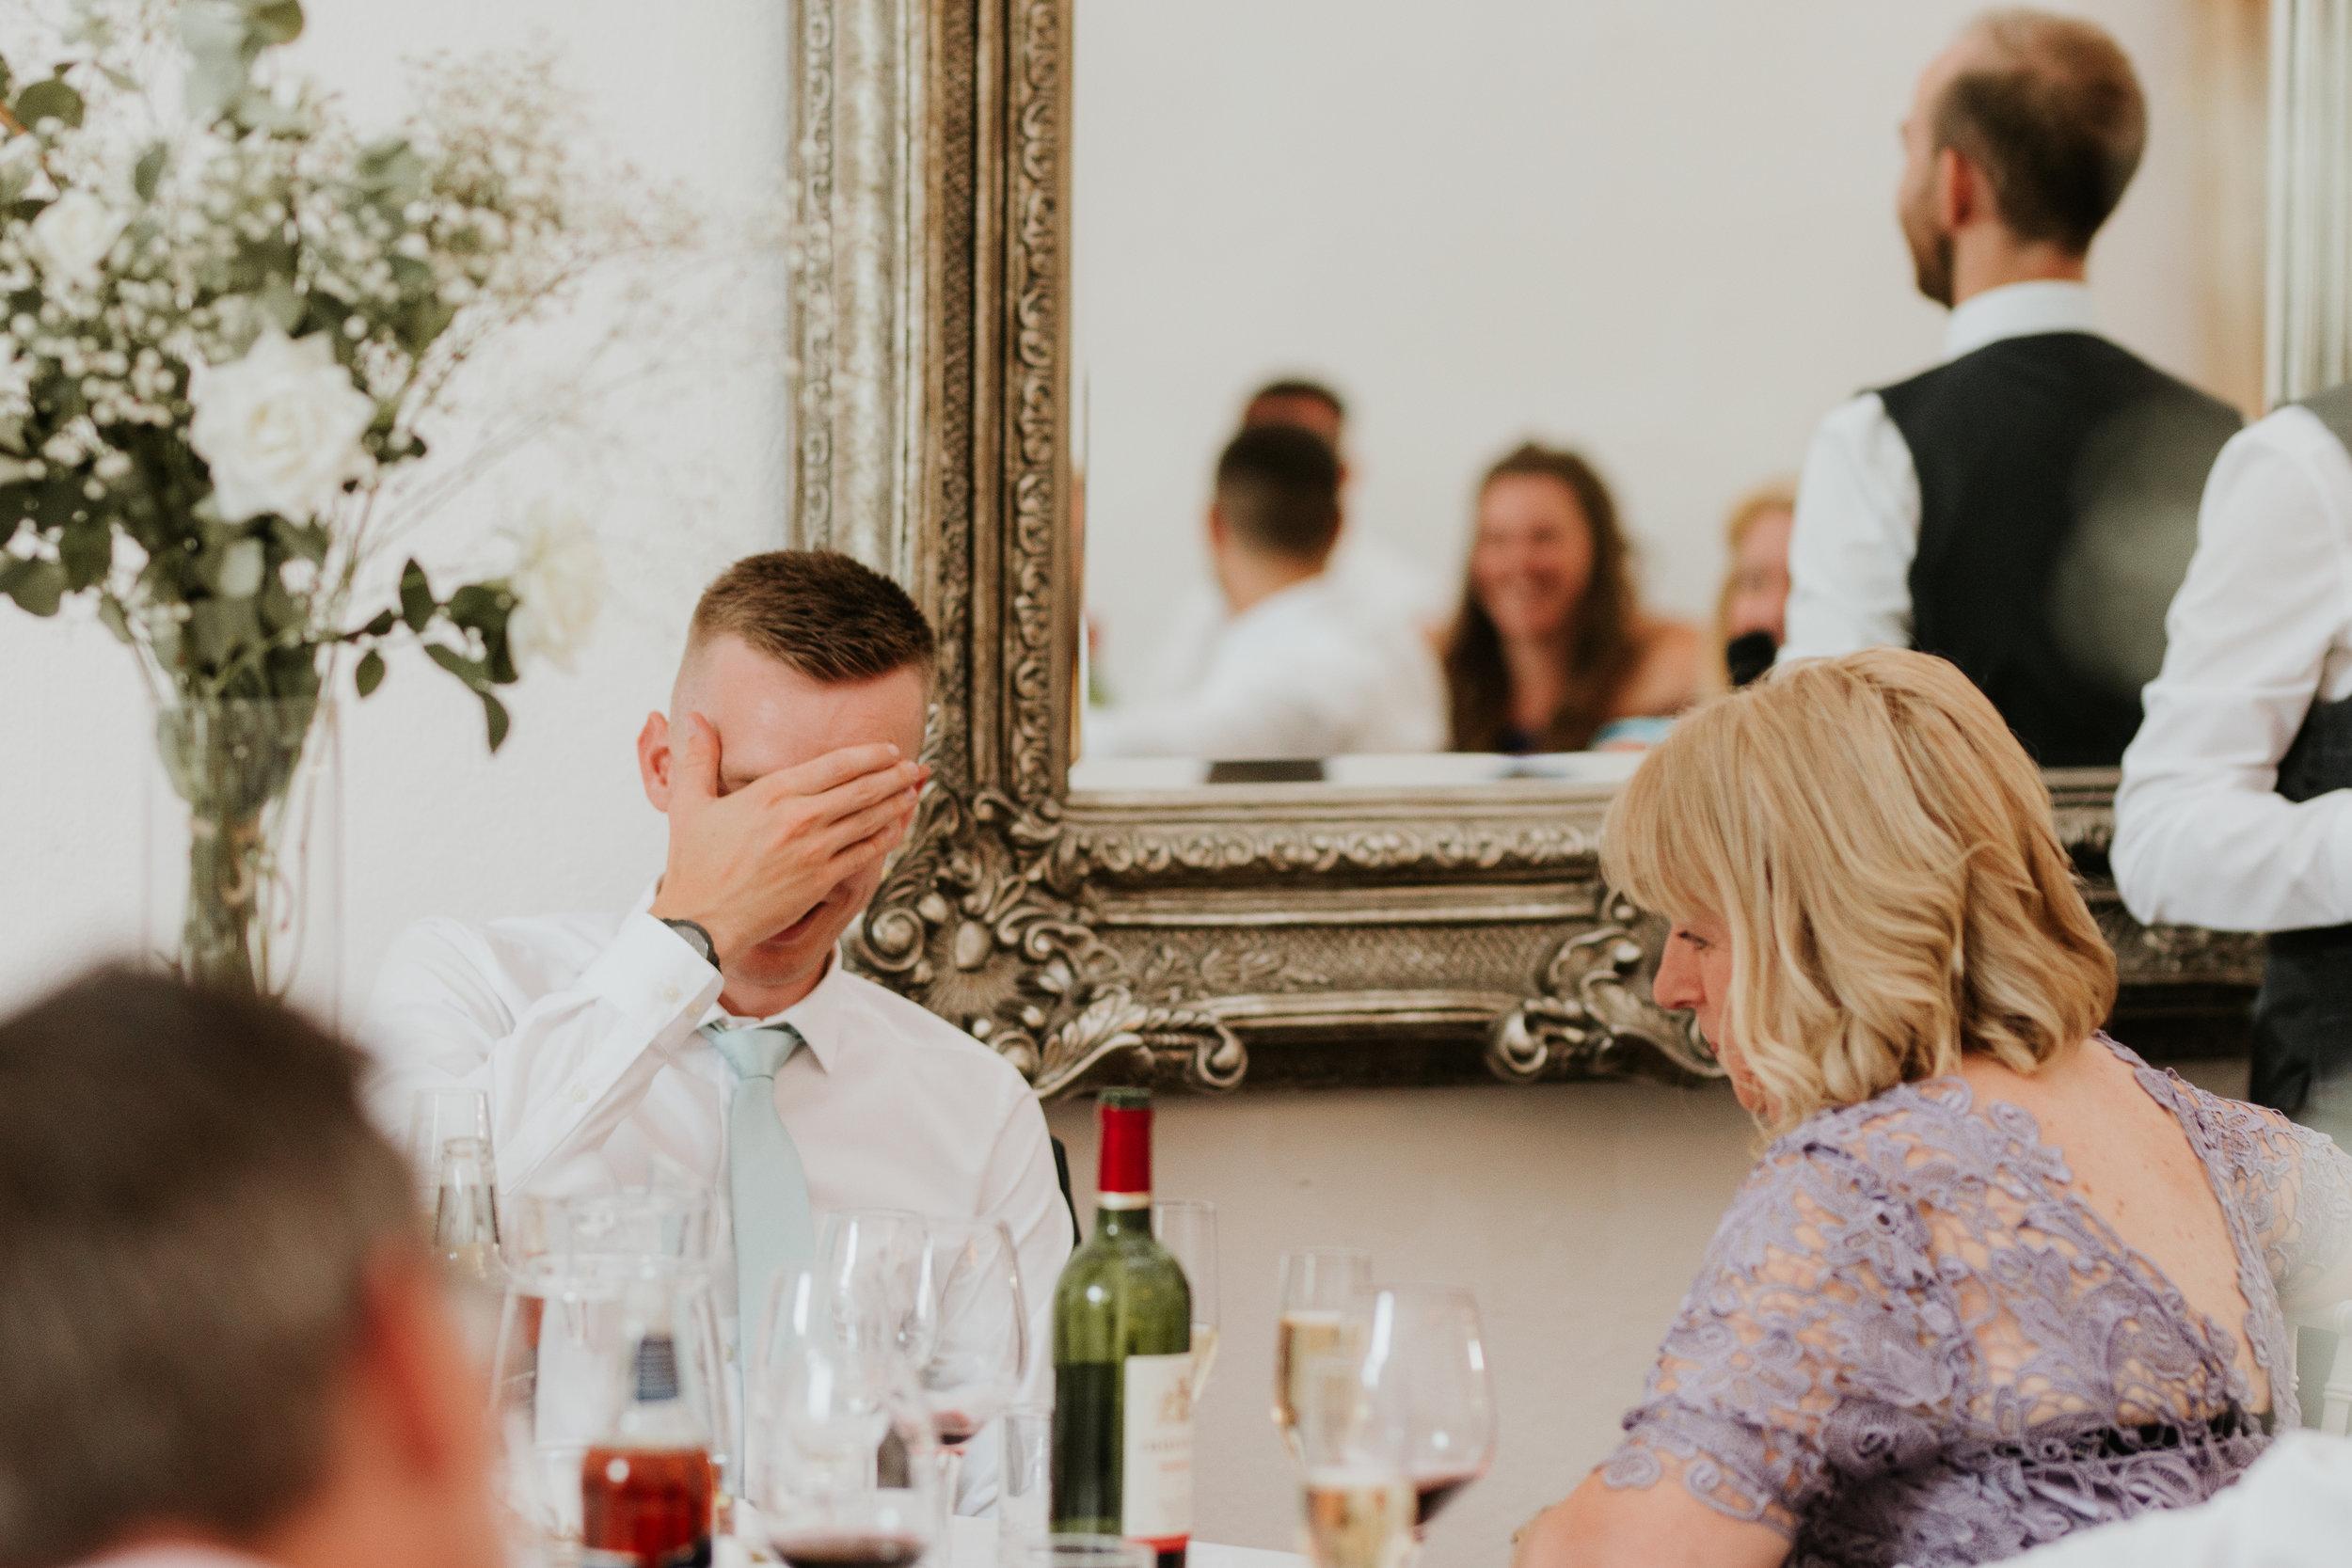 Oxfordshire-wedding-photographer-75.jpg